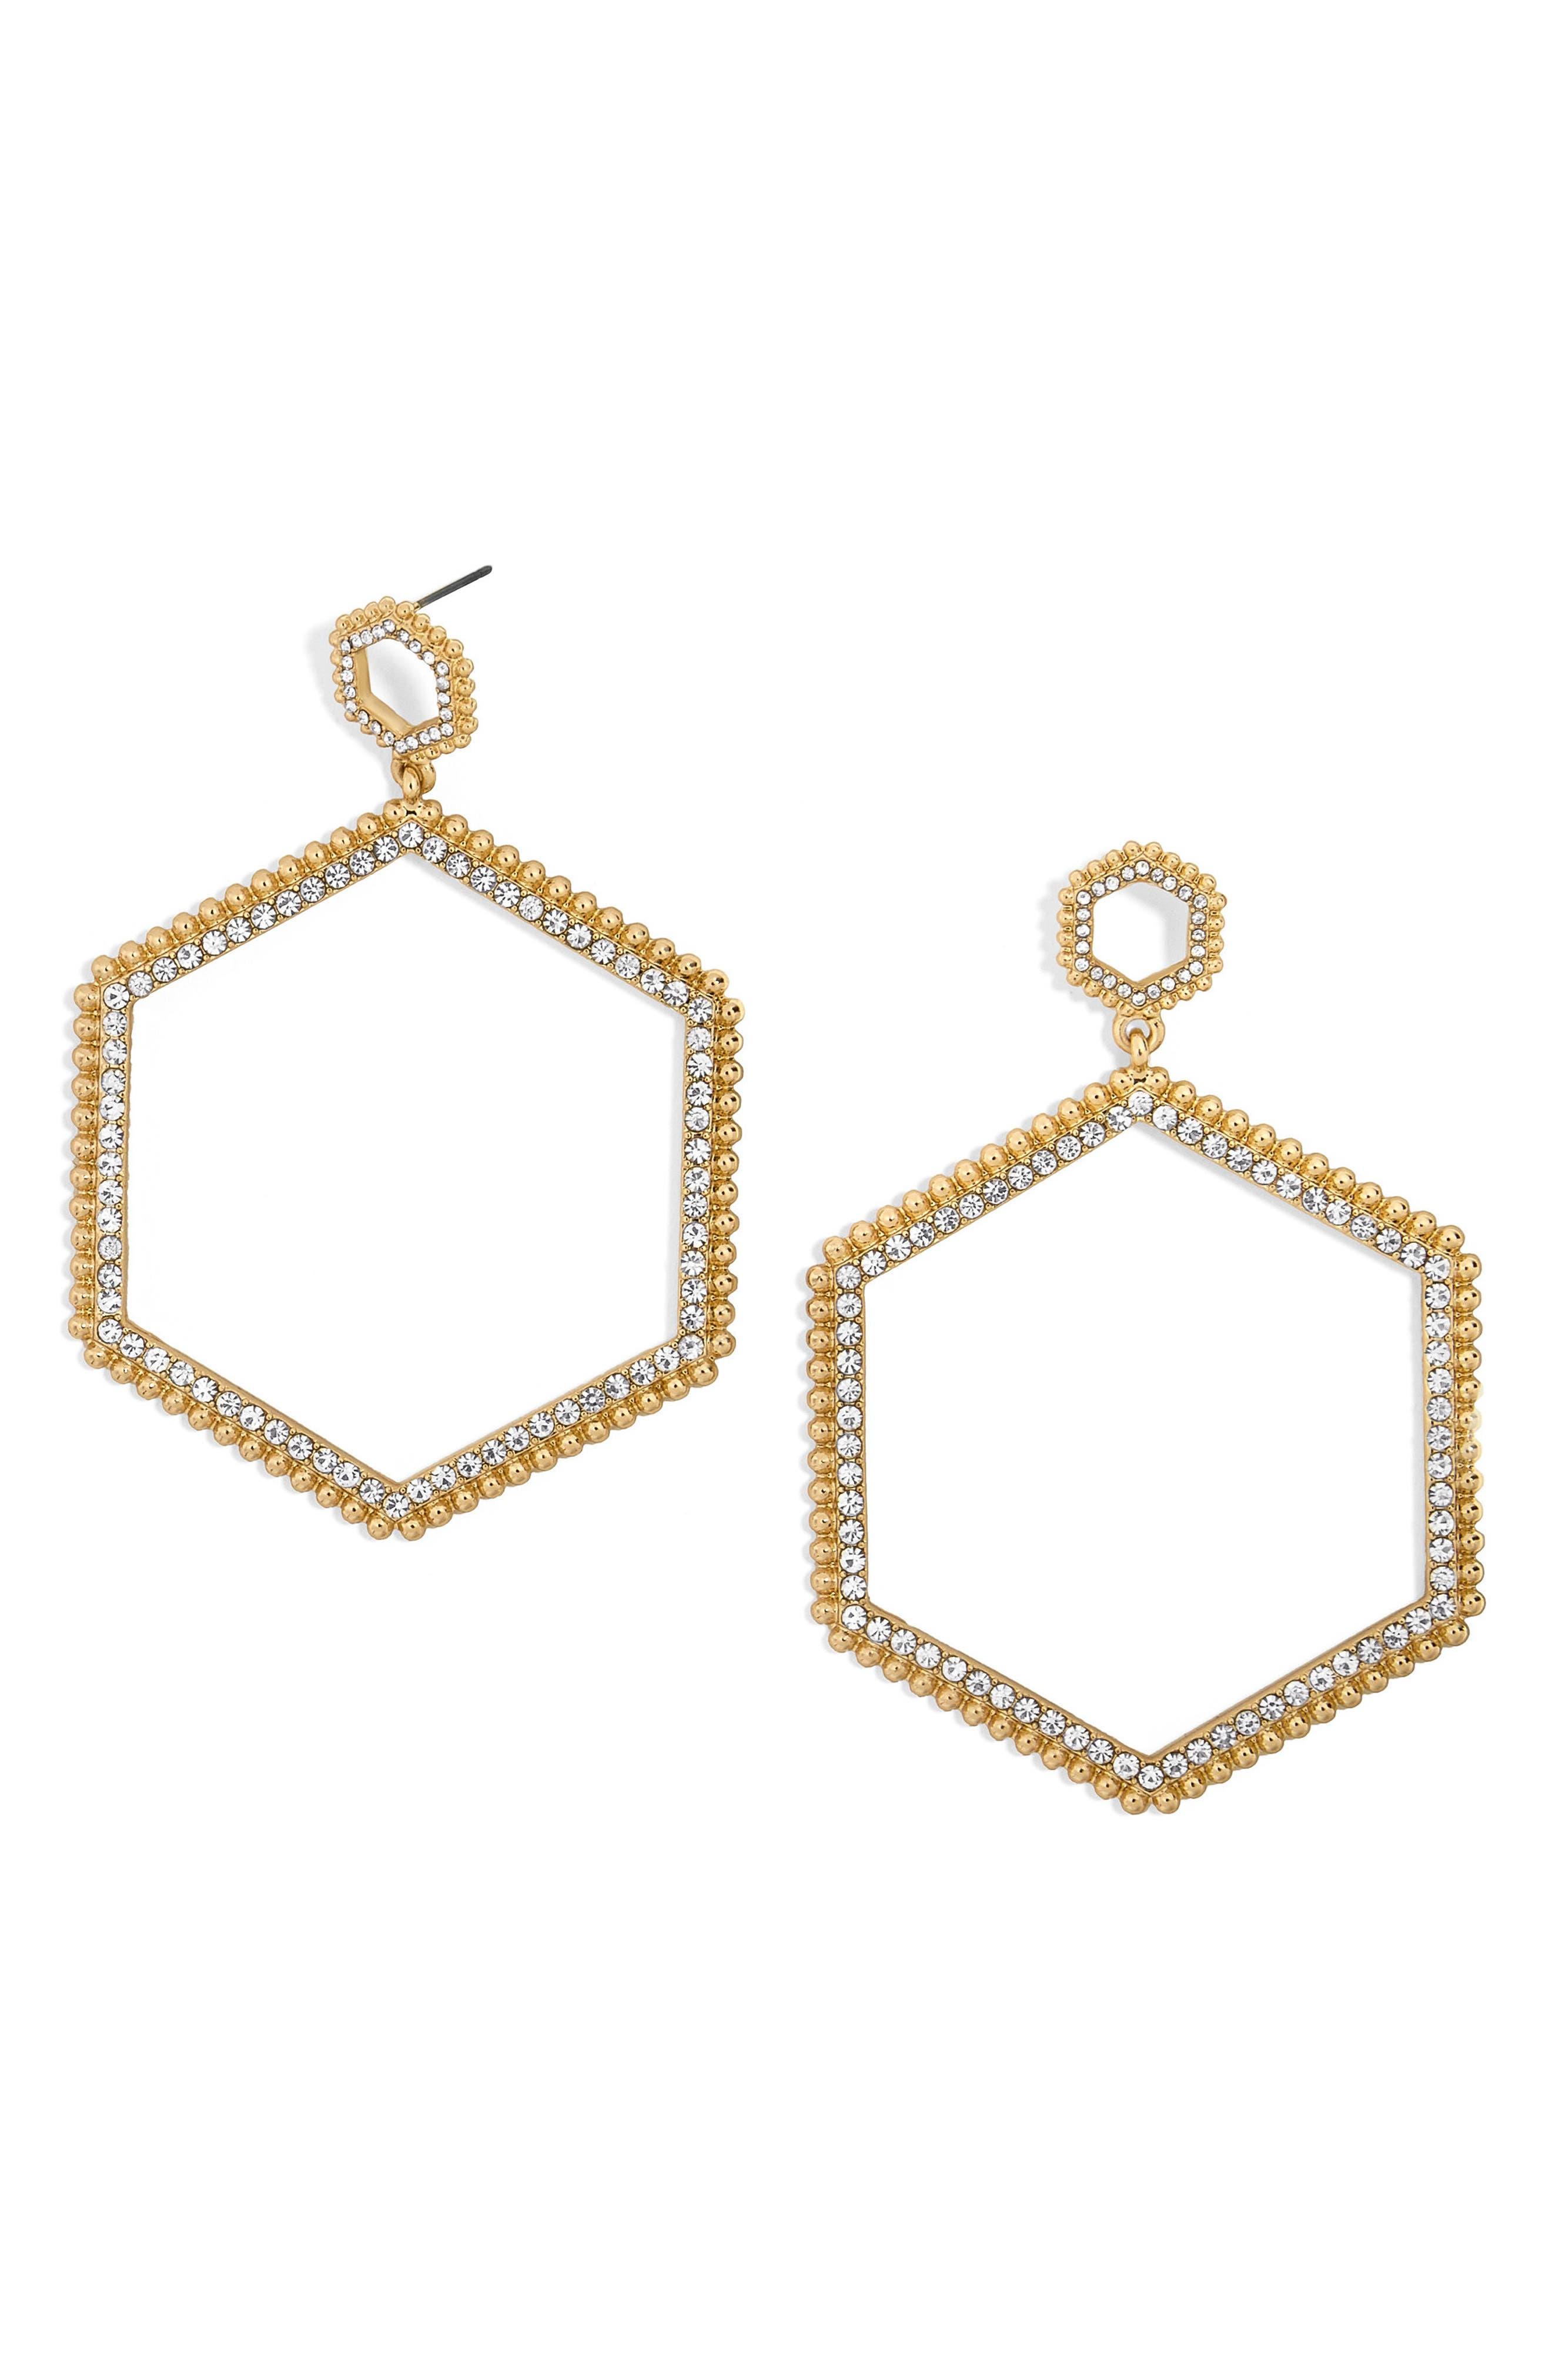 Hexagonal Hoop Earrings,                             Main thumbnail 1, color,                             Gold